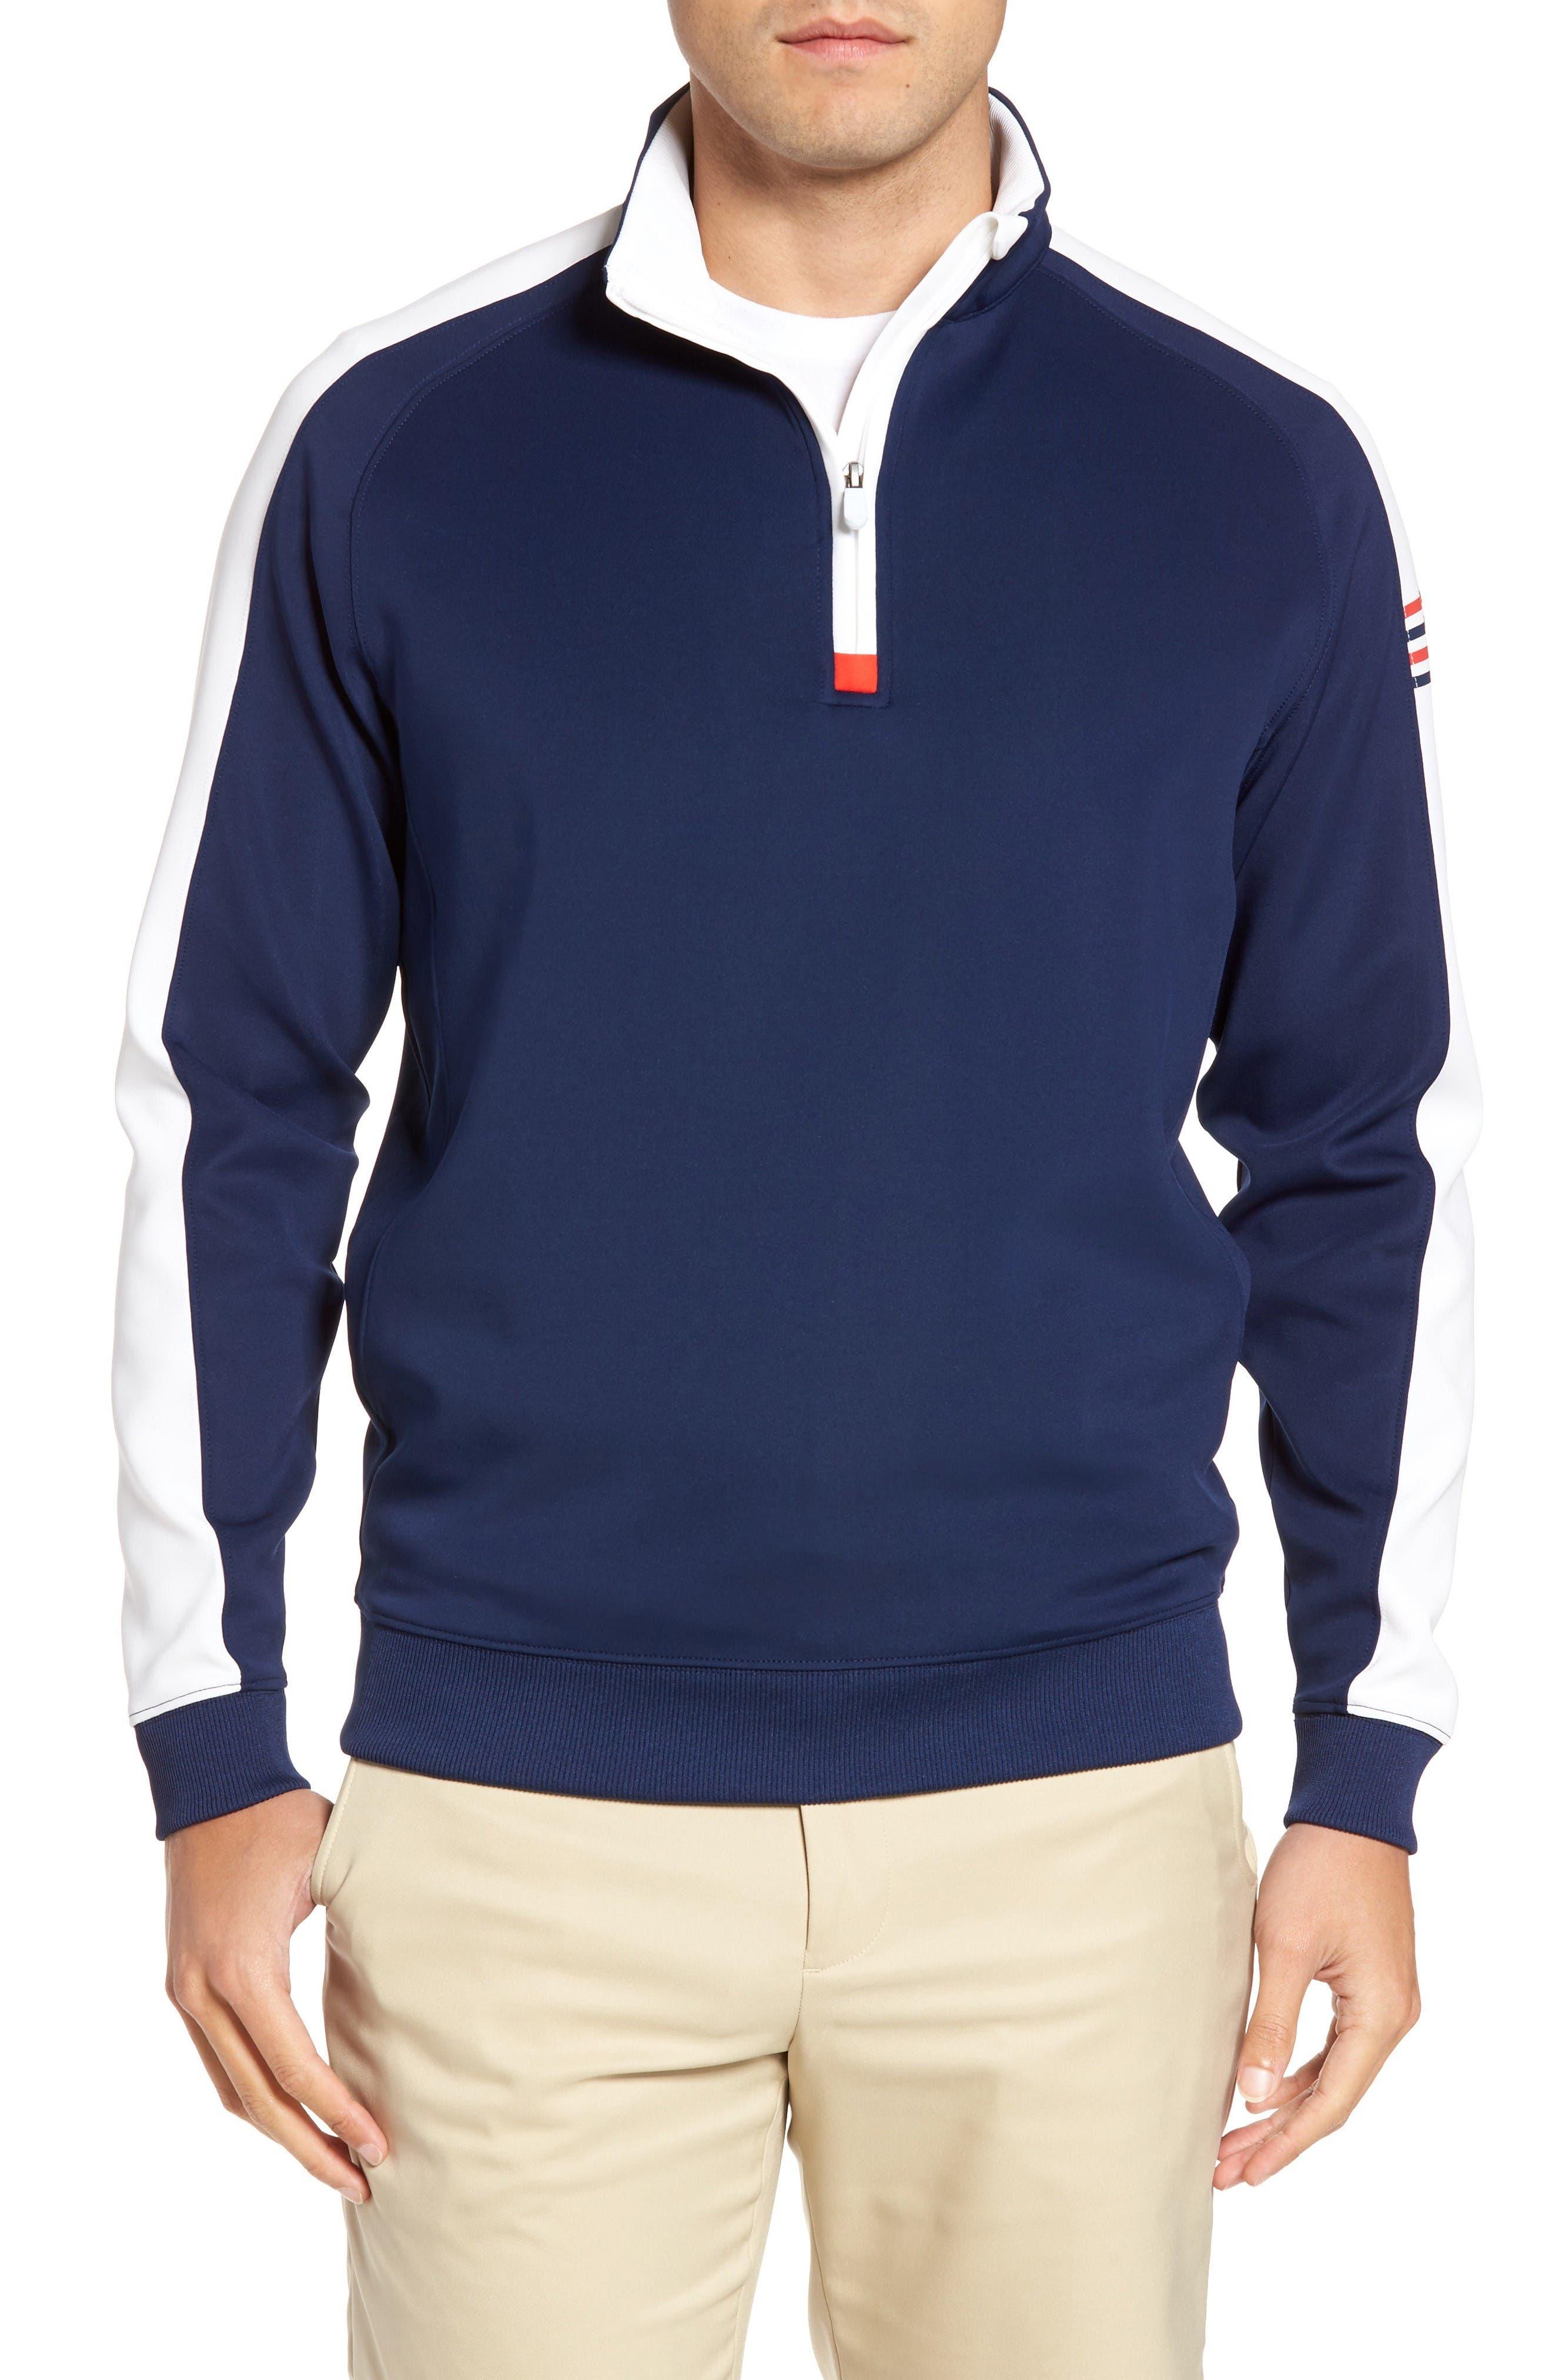 Bobby Jones XH20 Tech Quarter Zip Sweater